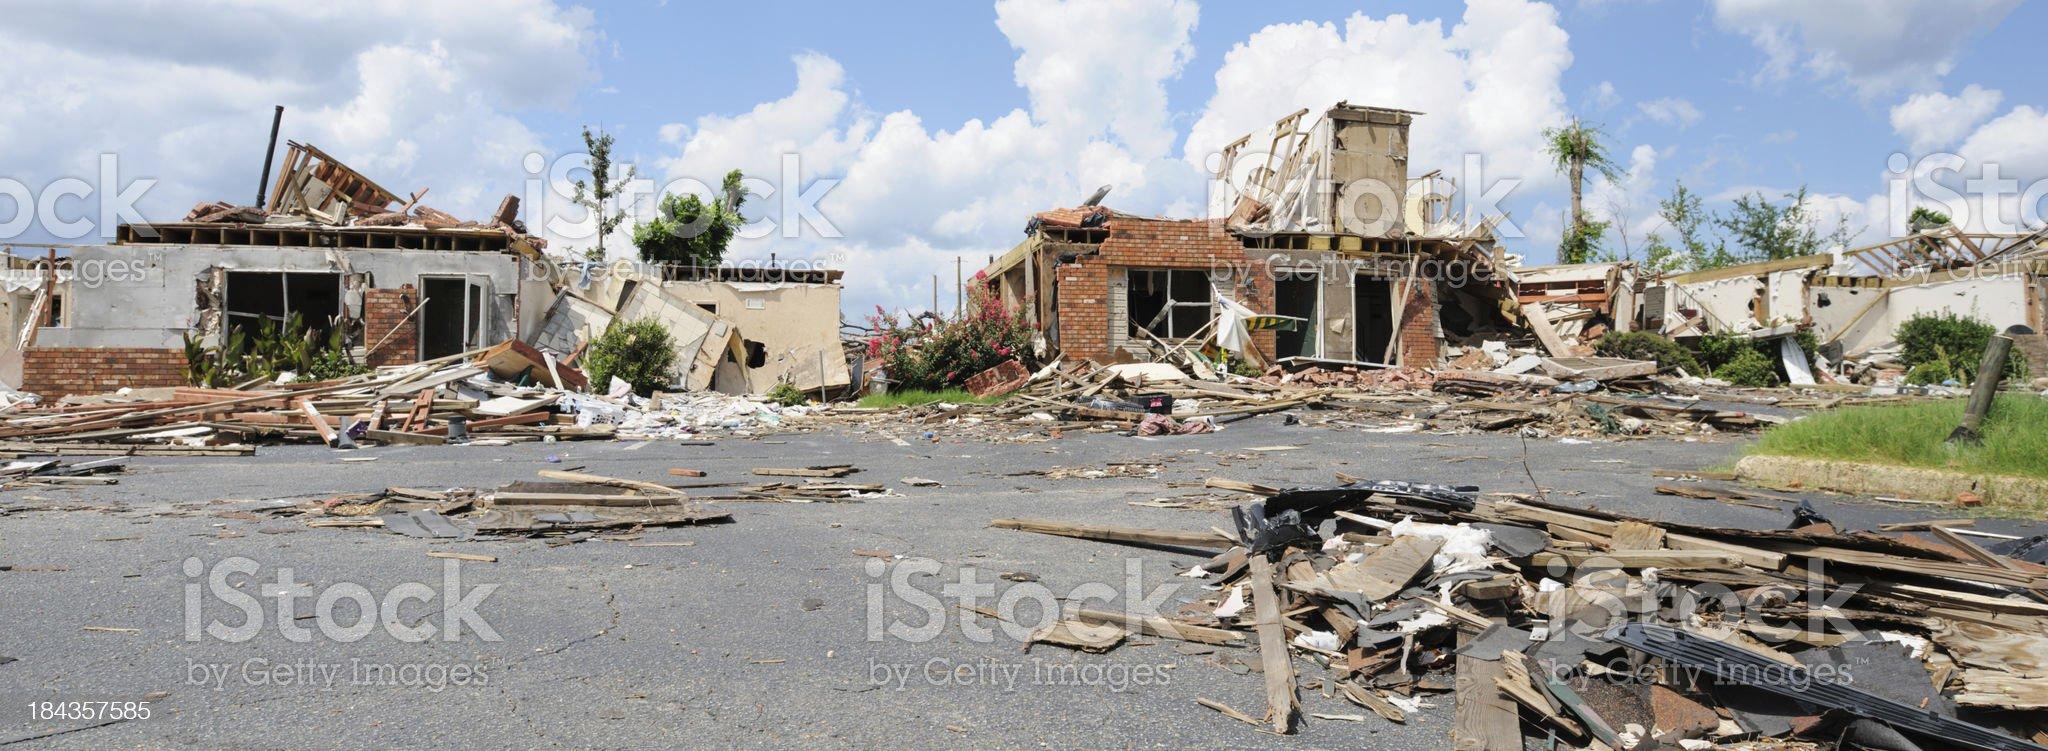 Panorama of tornado damage royalty-free stock photo